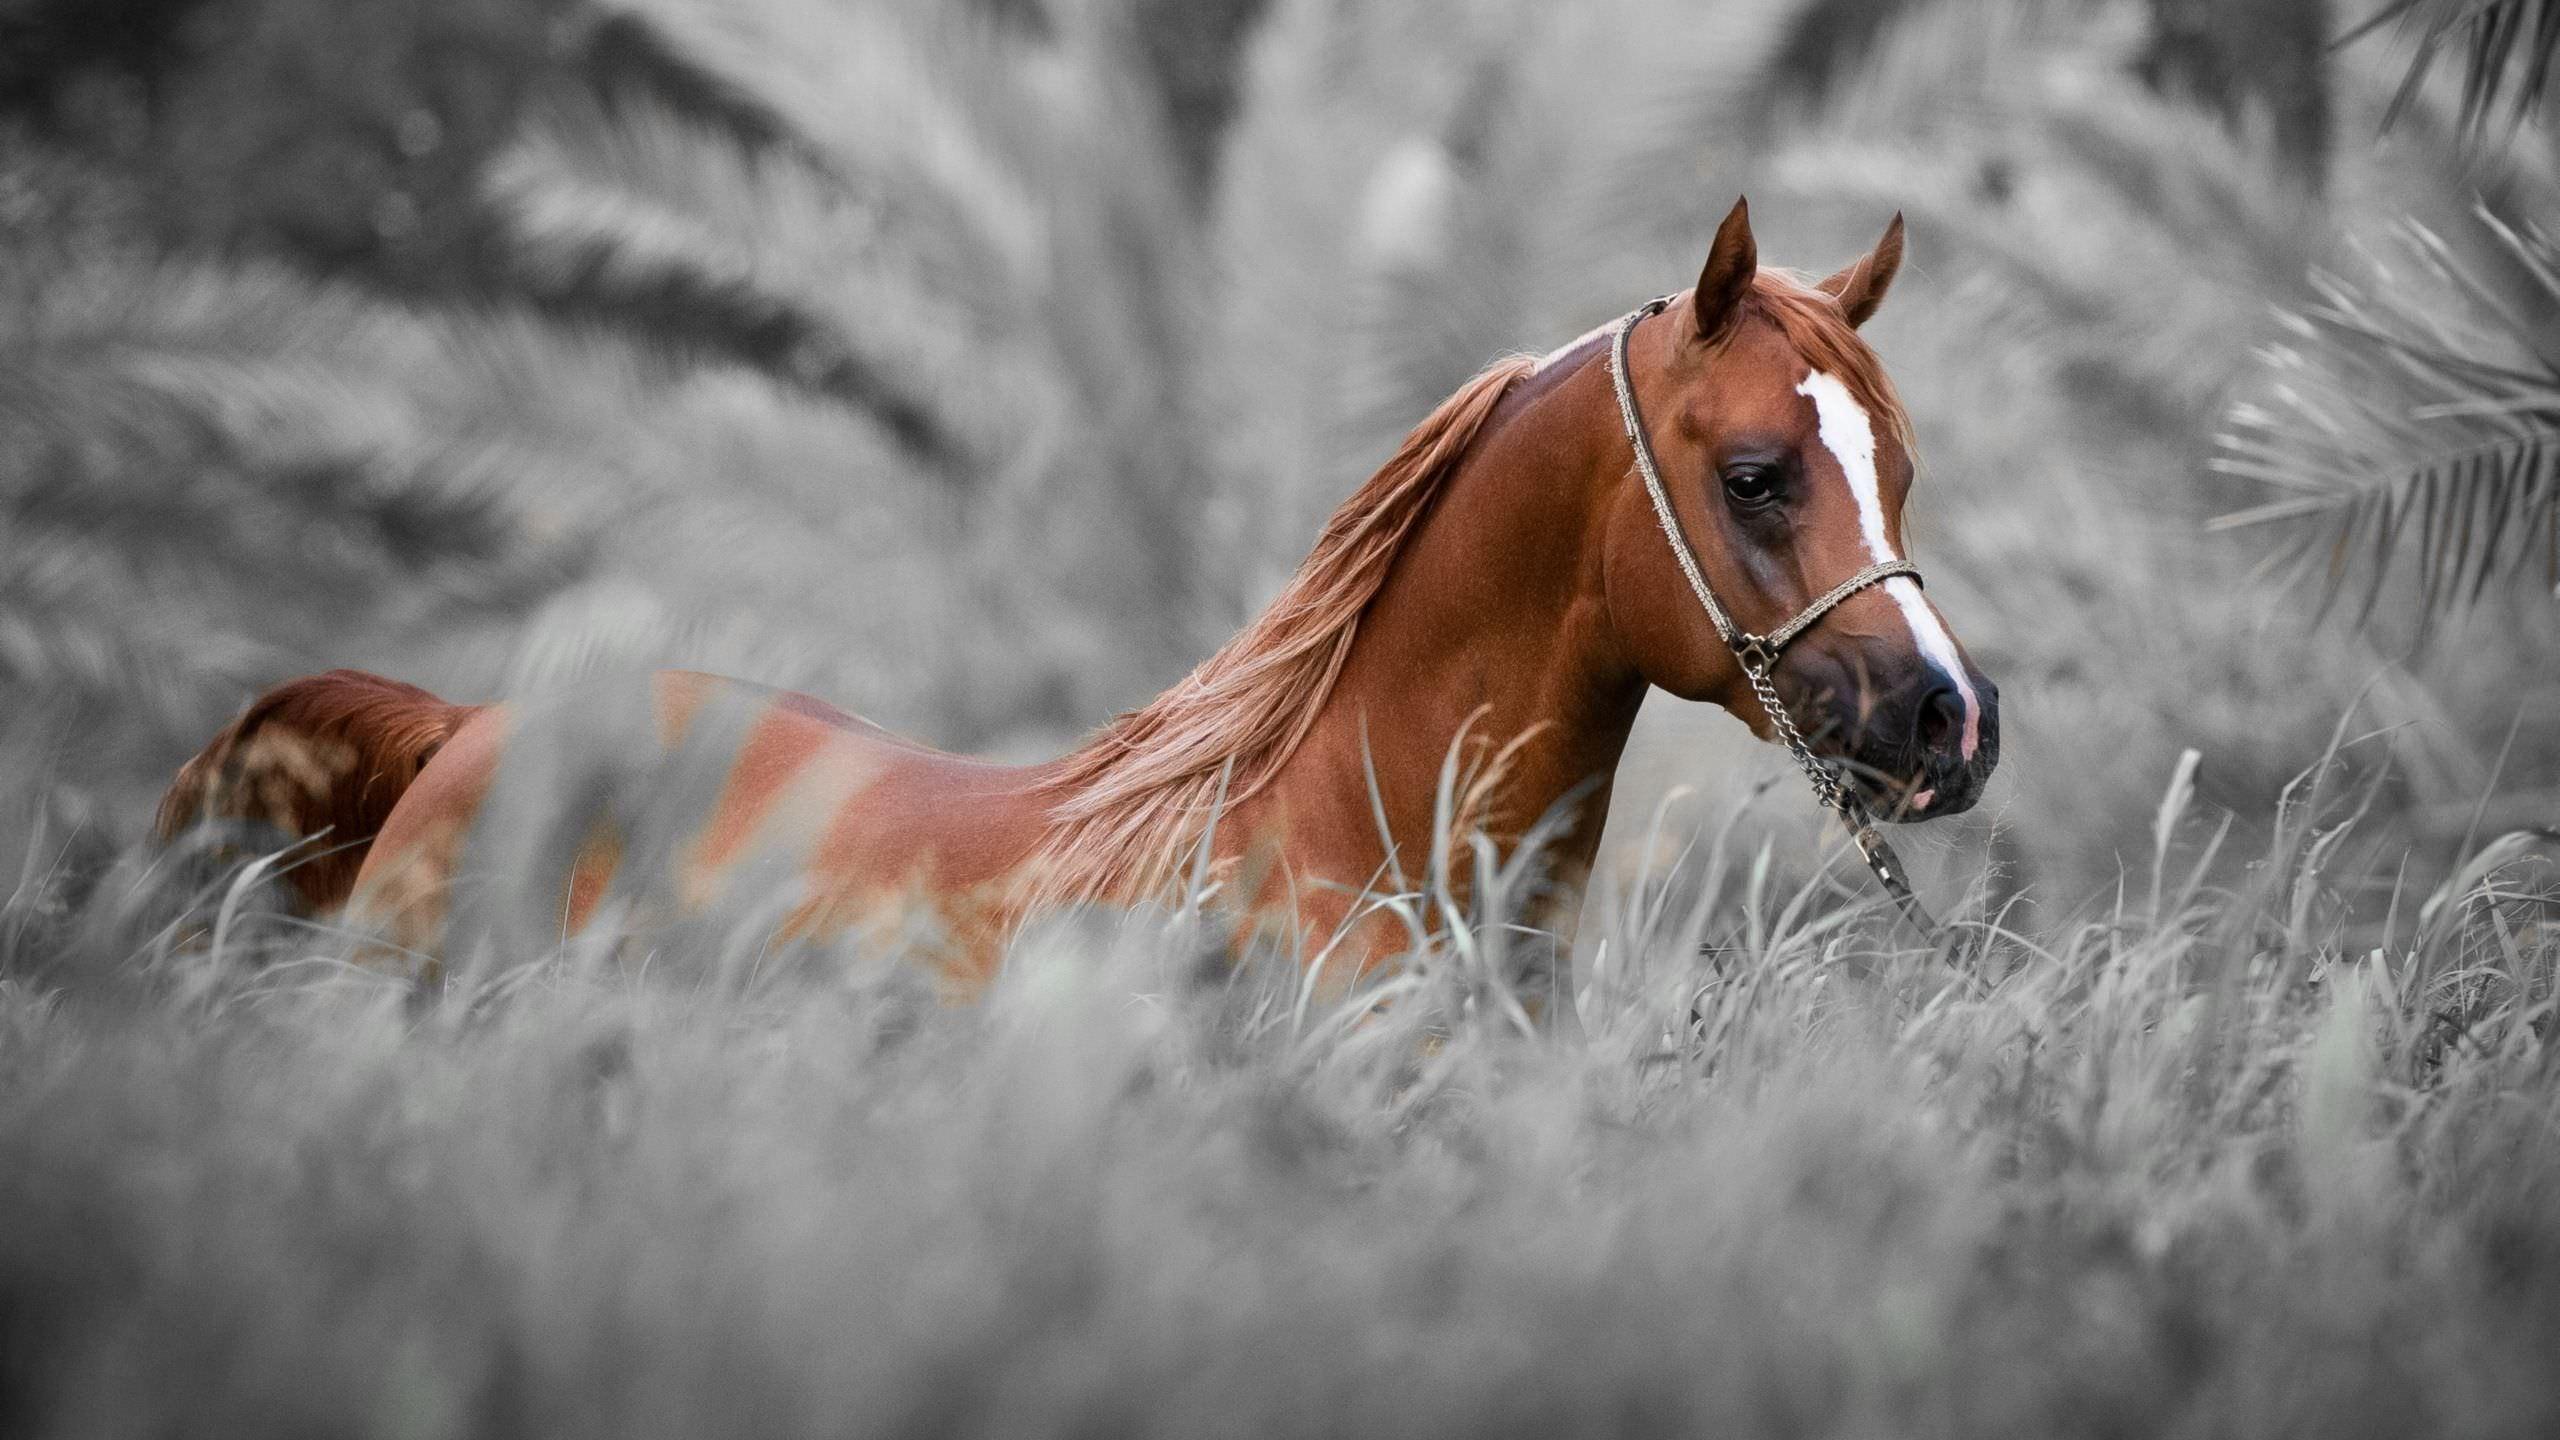 horse desktop backgrounds